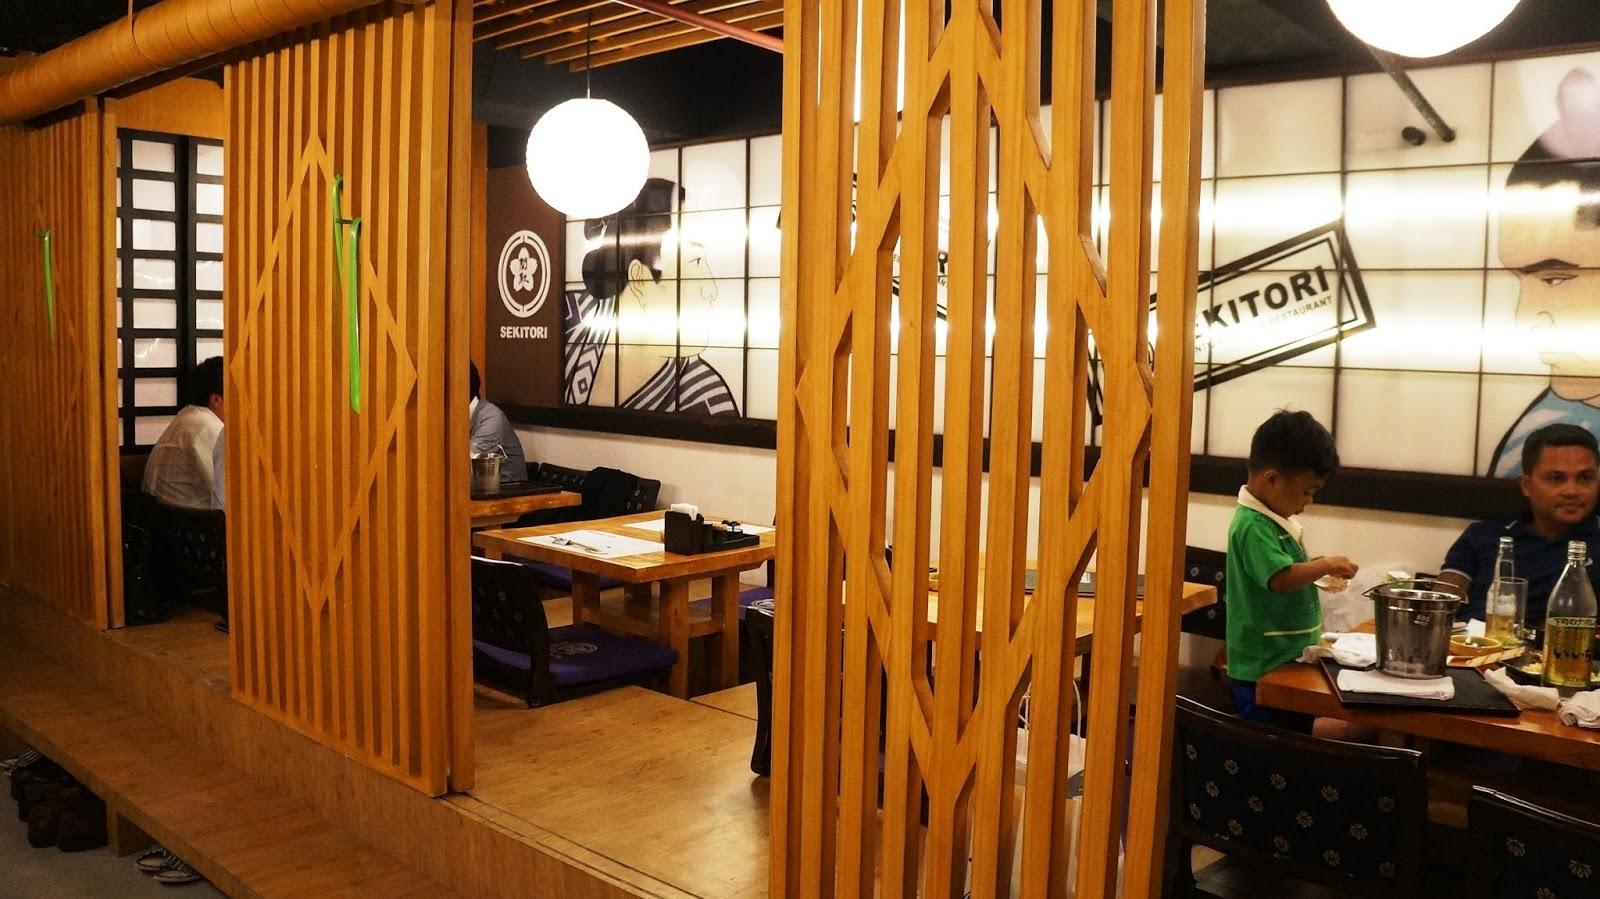 Sekitori authentic japanese restaurant wazzup pilipinas for Japanese interior design concept